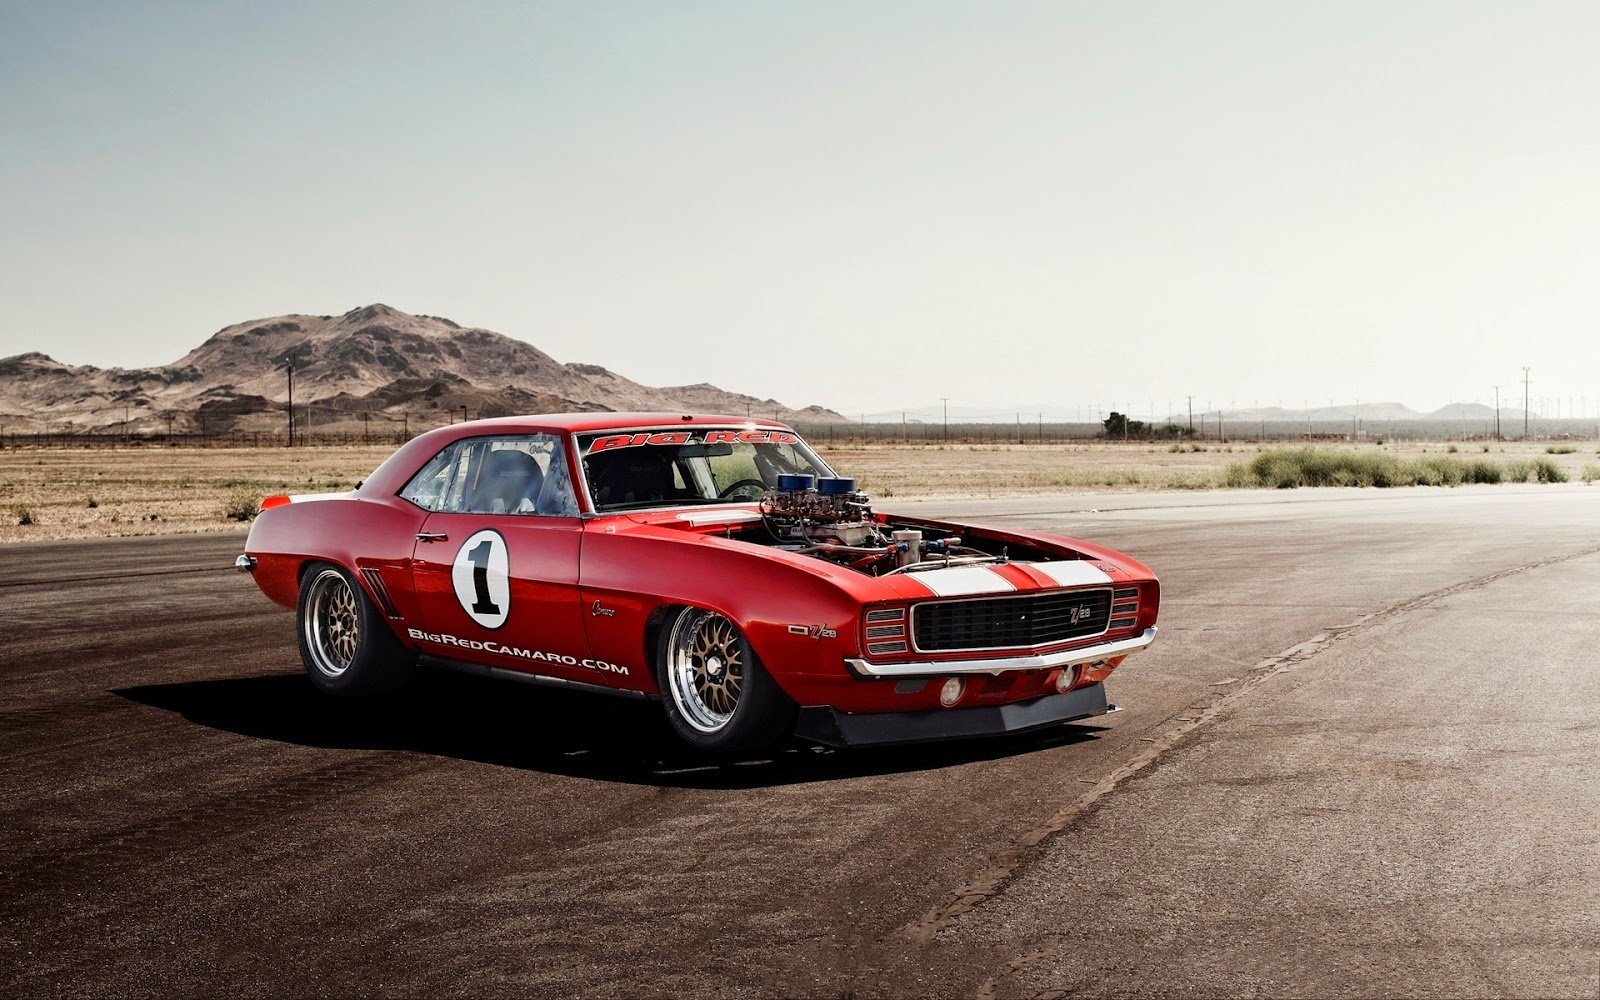 6Th Gen Camaro >> Classic American Cars: Chevrolet Camaro 1st gen 1966-1969